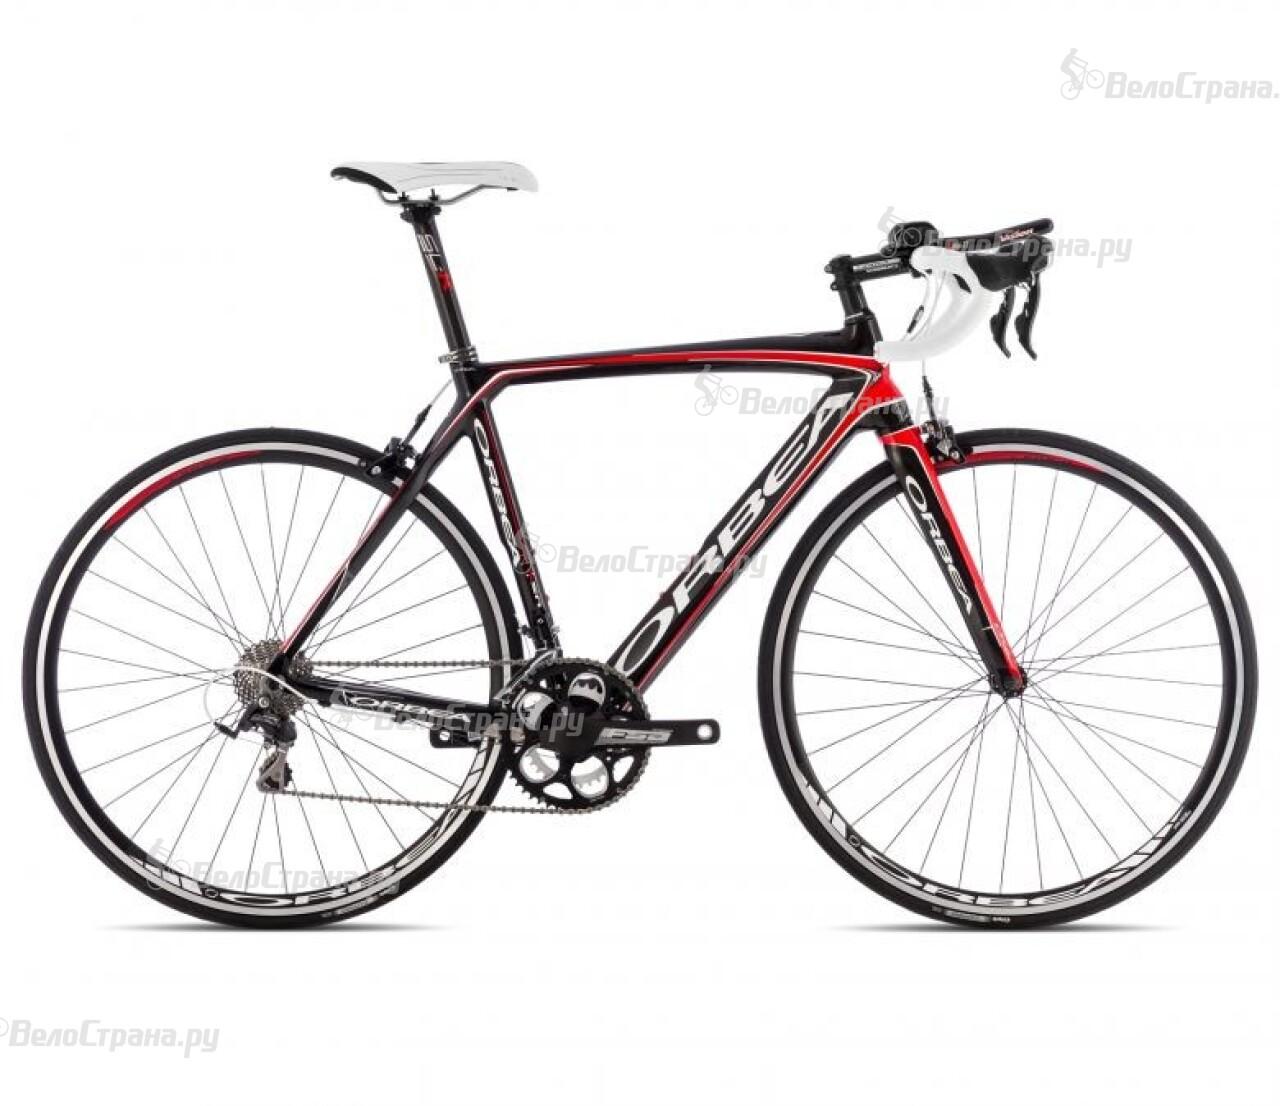 Велосипед Orbea Orca B Tri M10 (2014) велосипед orbea orca dama gth 2013